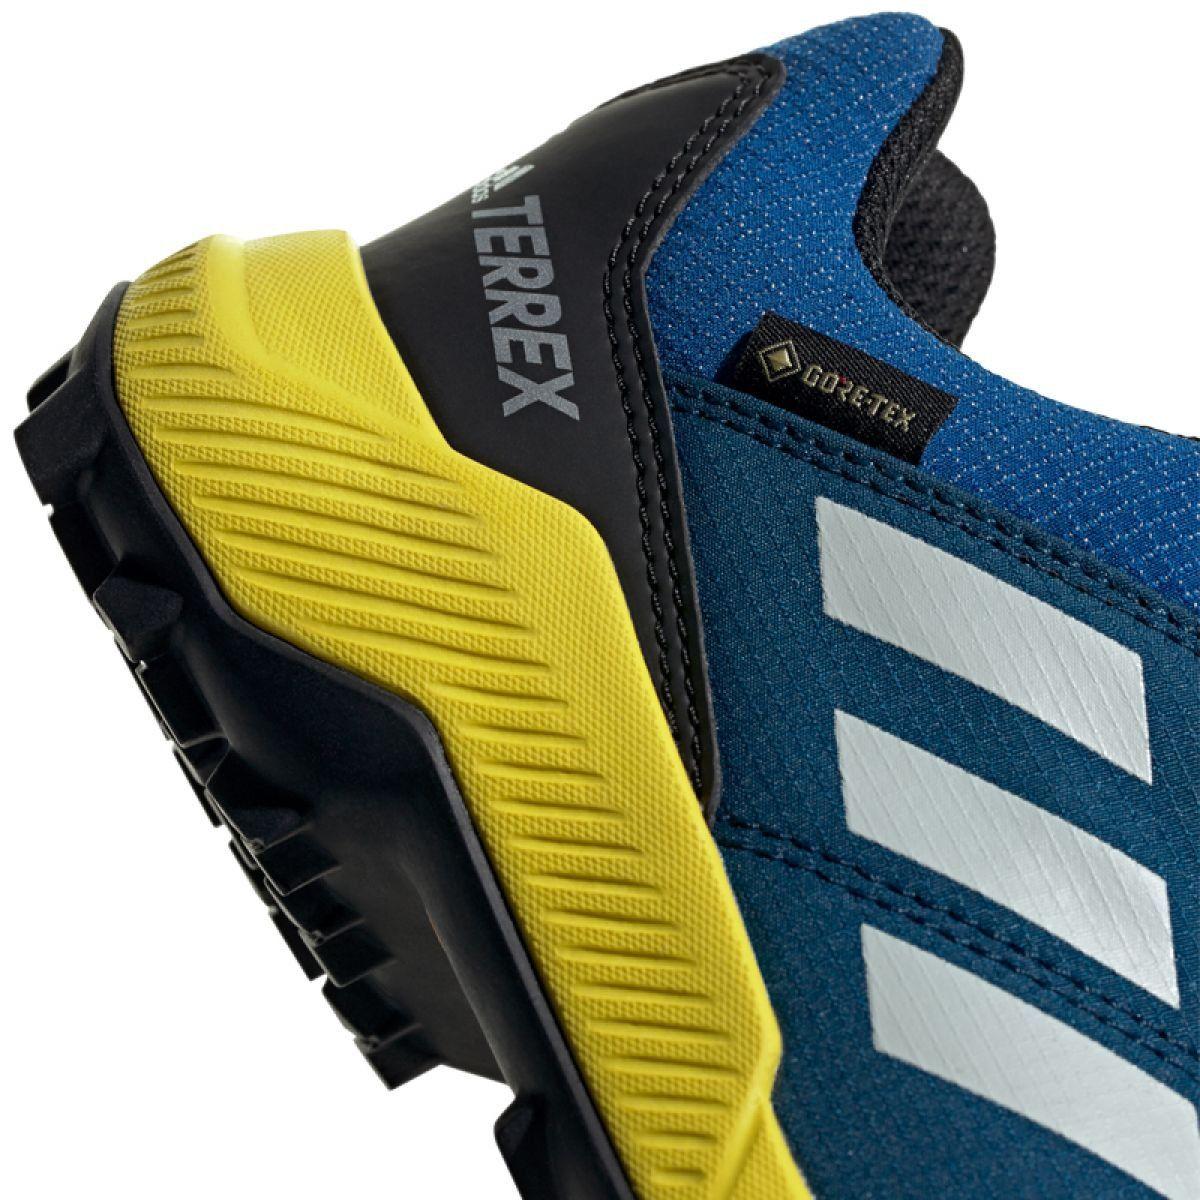 Buty Adidas Terrex Gtx Jr Bc0599 Niebieskie Junior Shoes Sports Shoes Adidas Durable Shoes